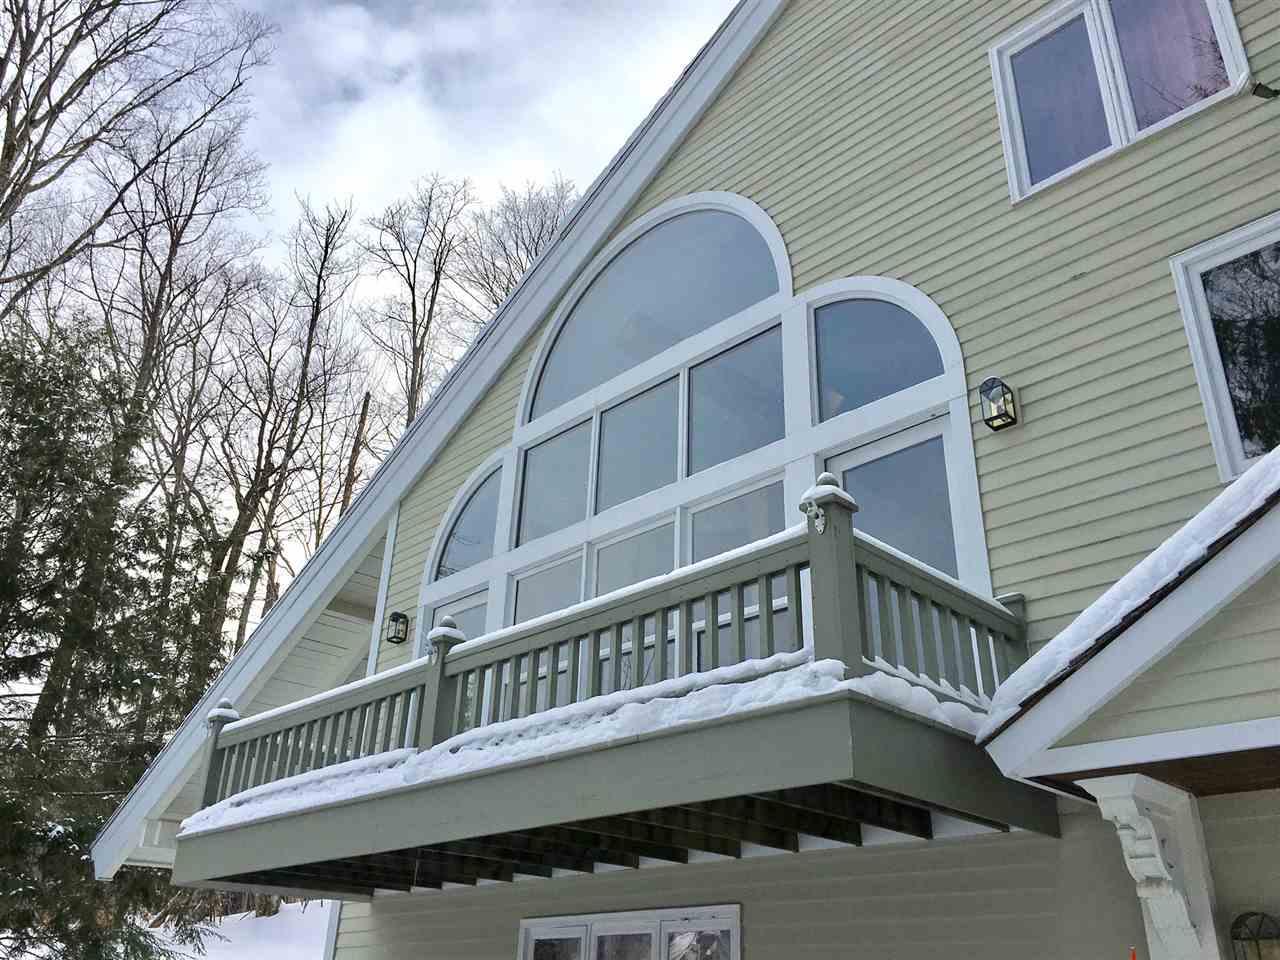 Mount-Snow-Real-Estate-4614113-15